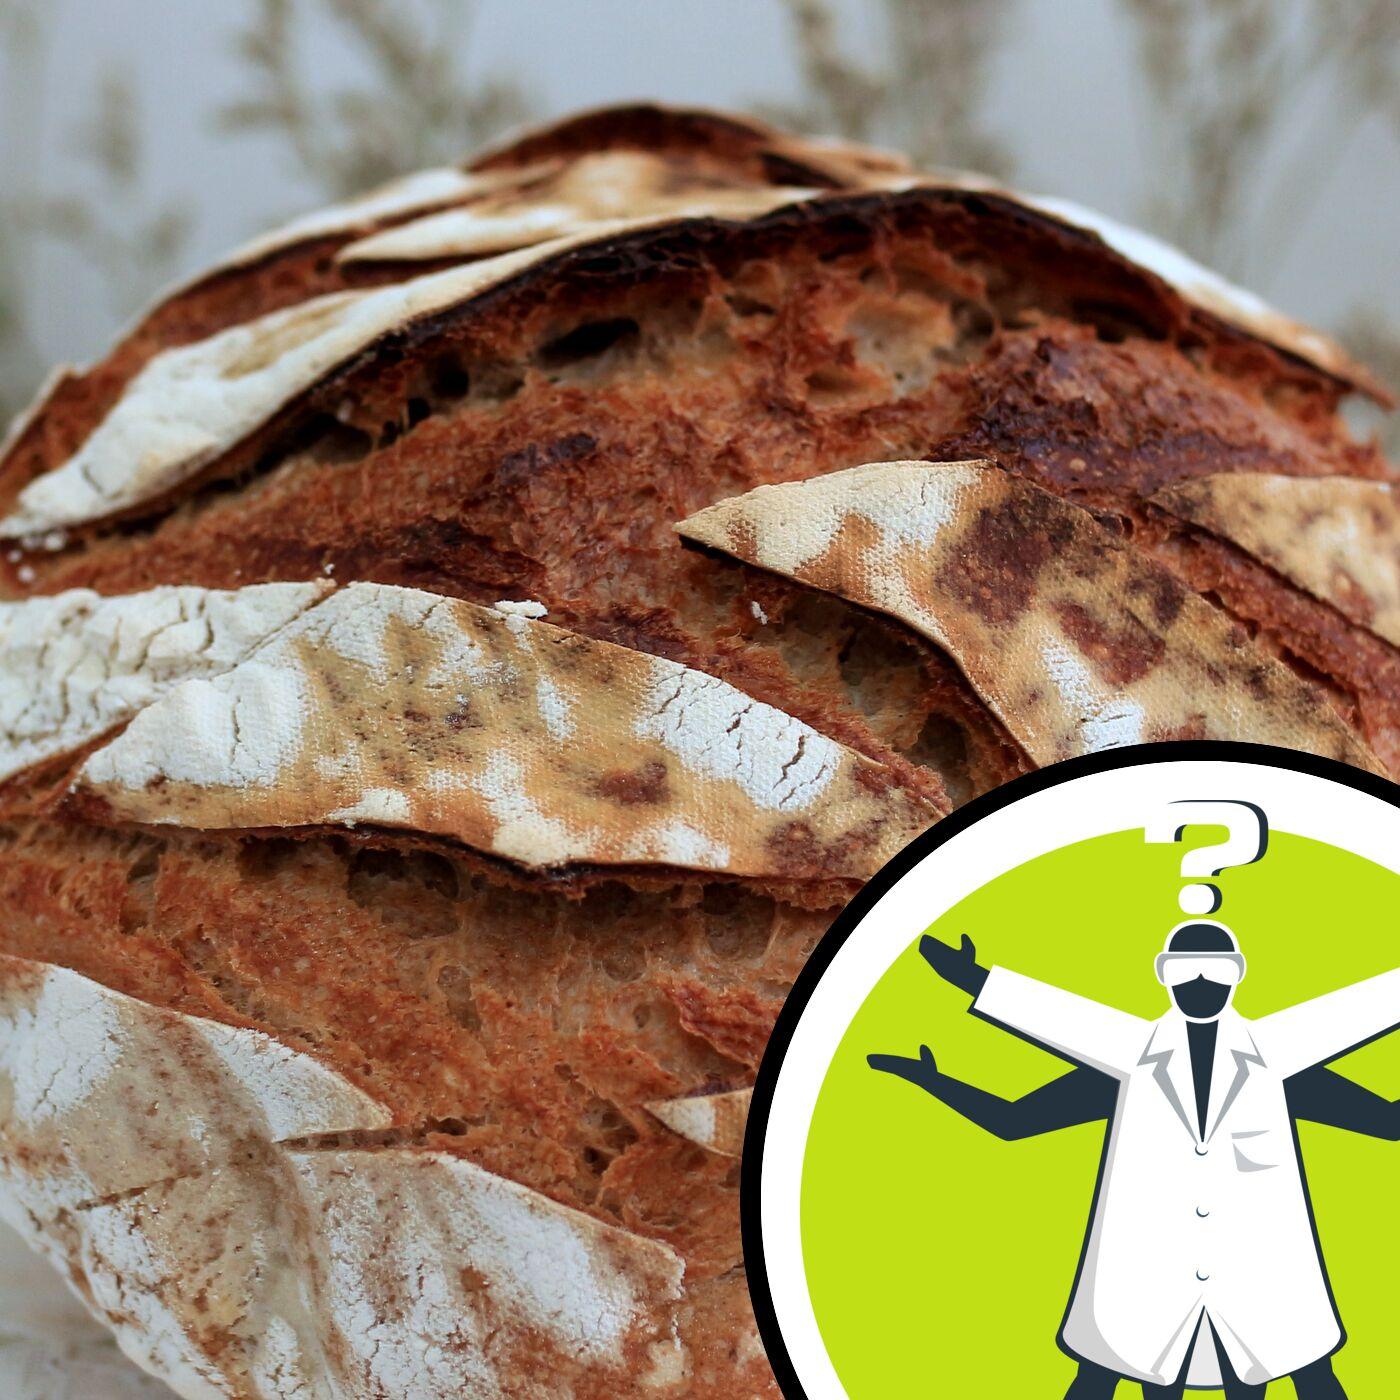 Is sourdough bread a healthy option?